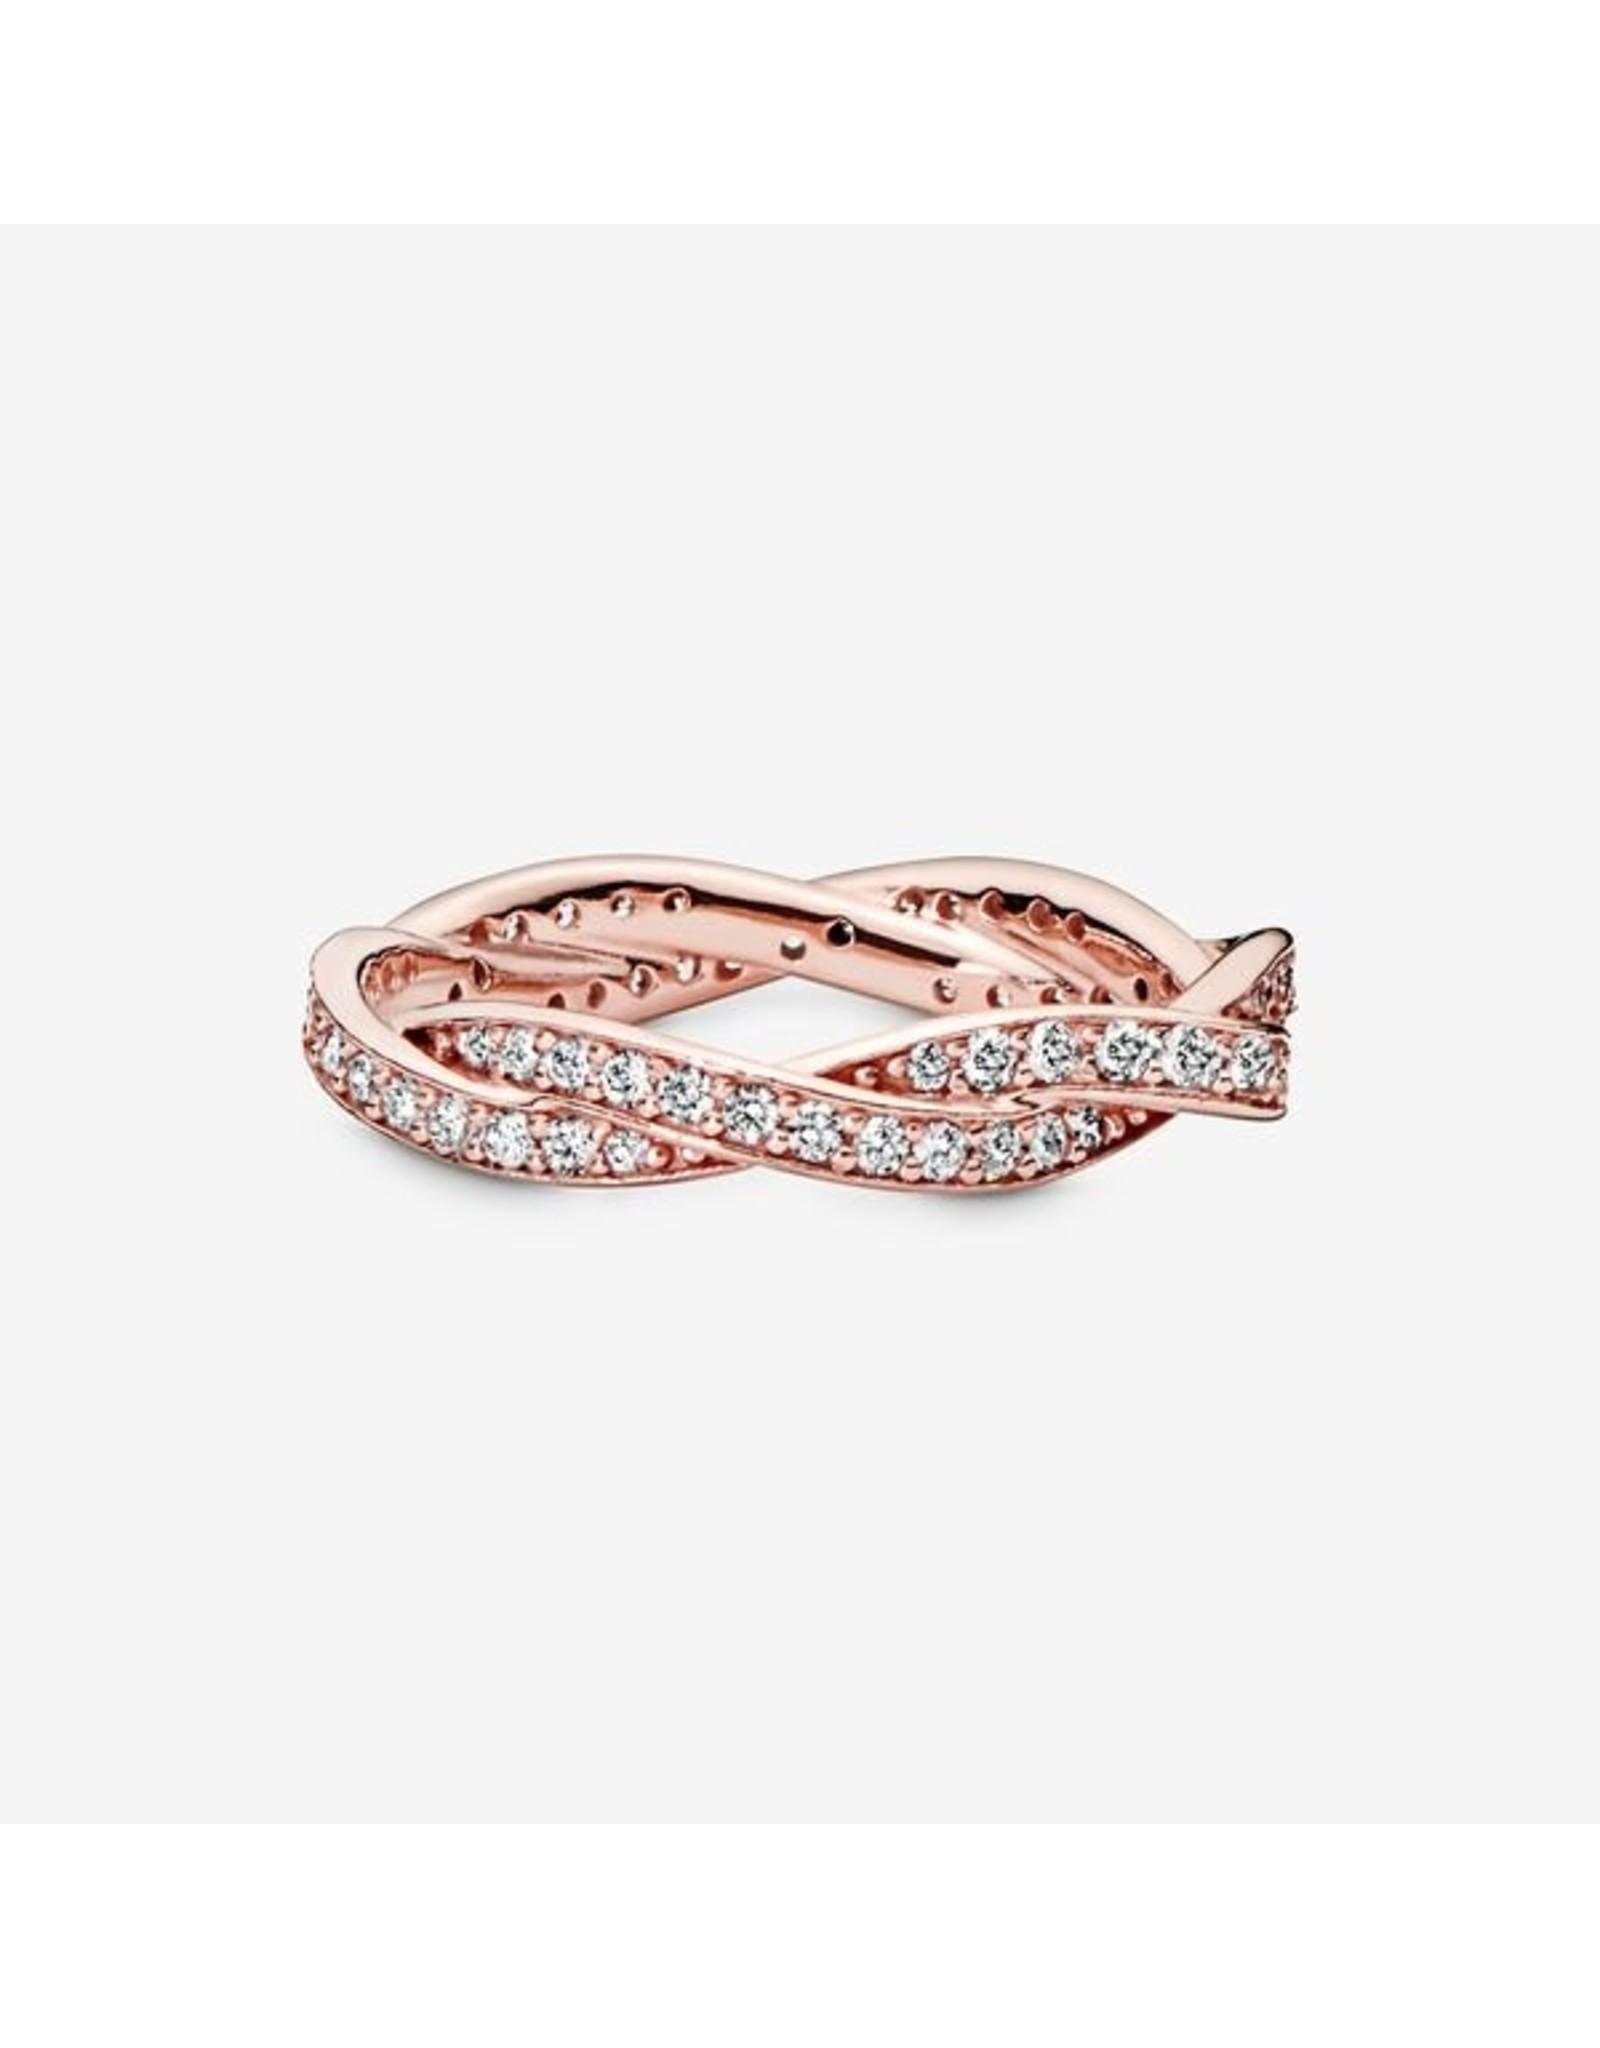 Pandora Pandora Ring, (180892CZ) Rose Gold, Twist Of Fate, Clear CZ